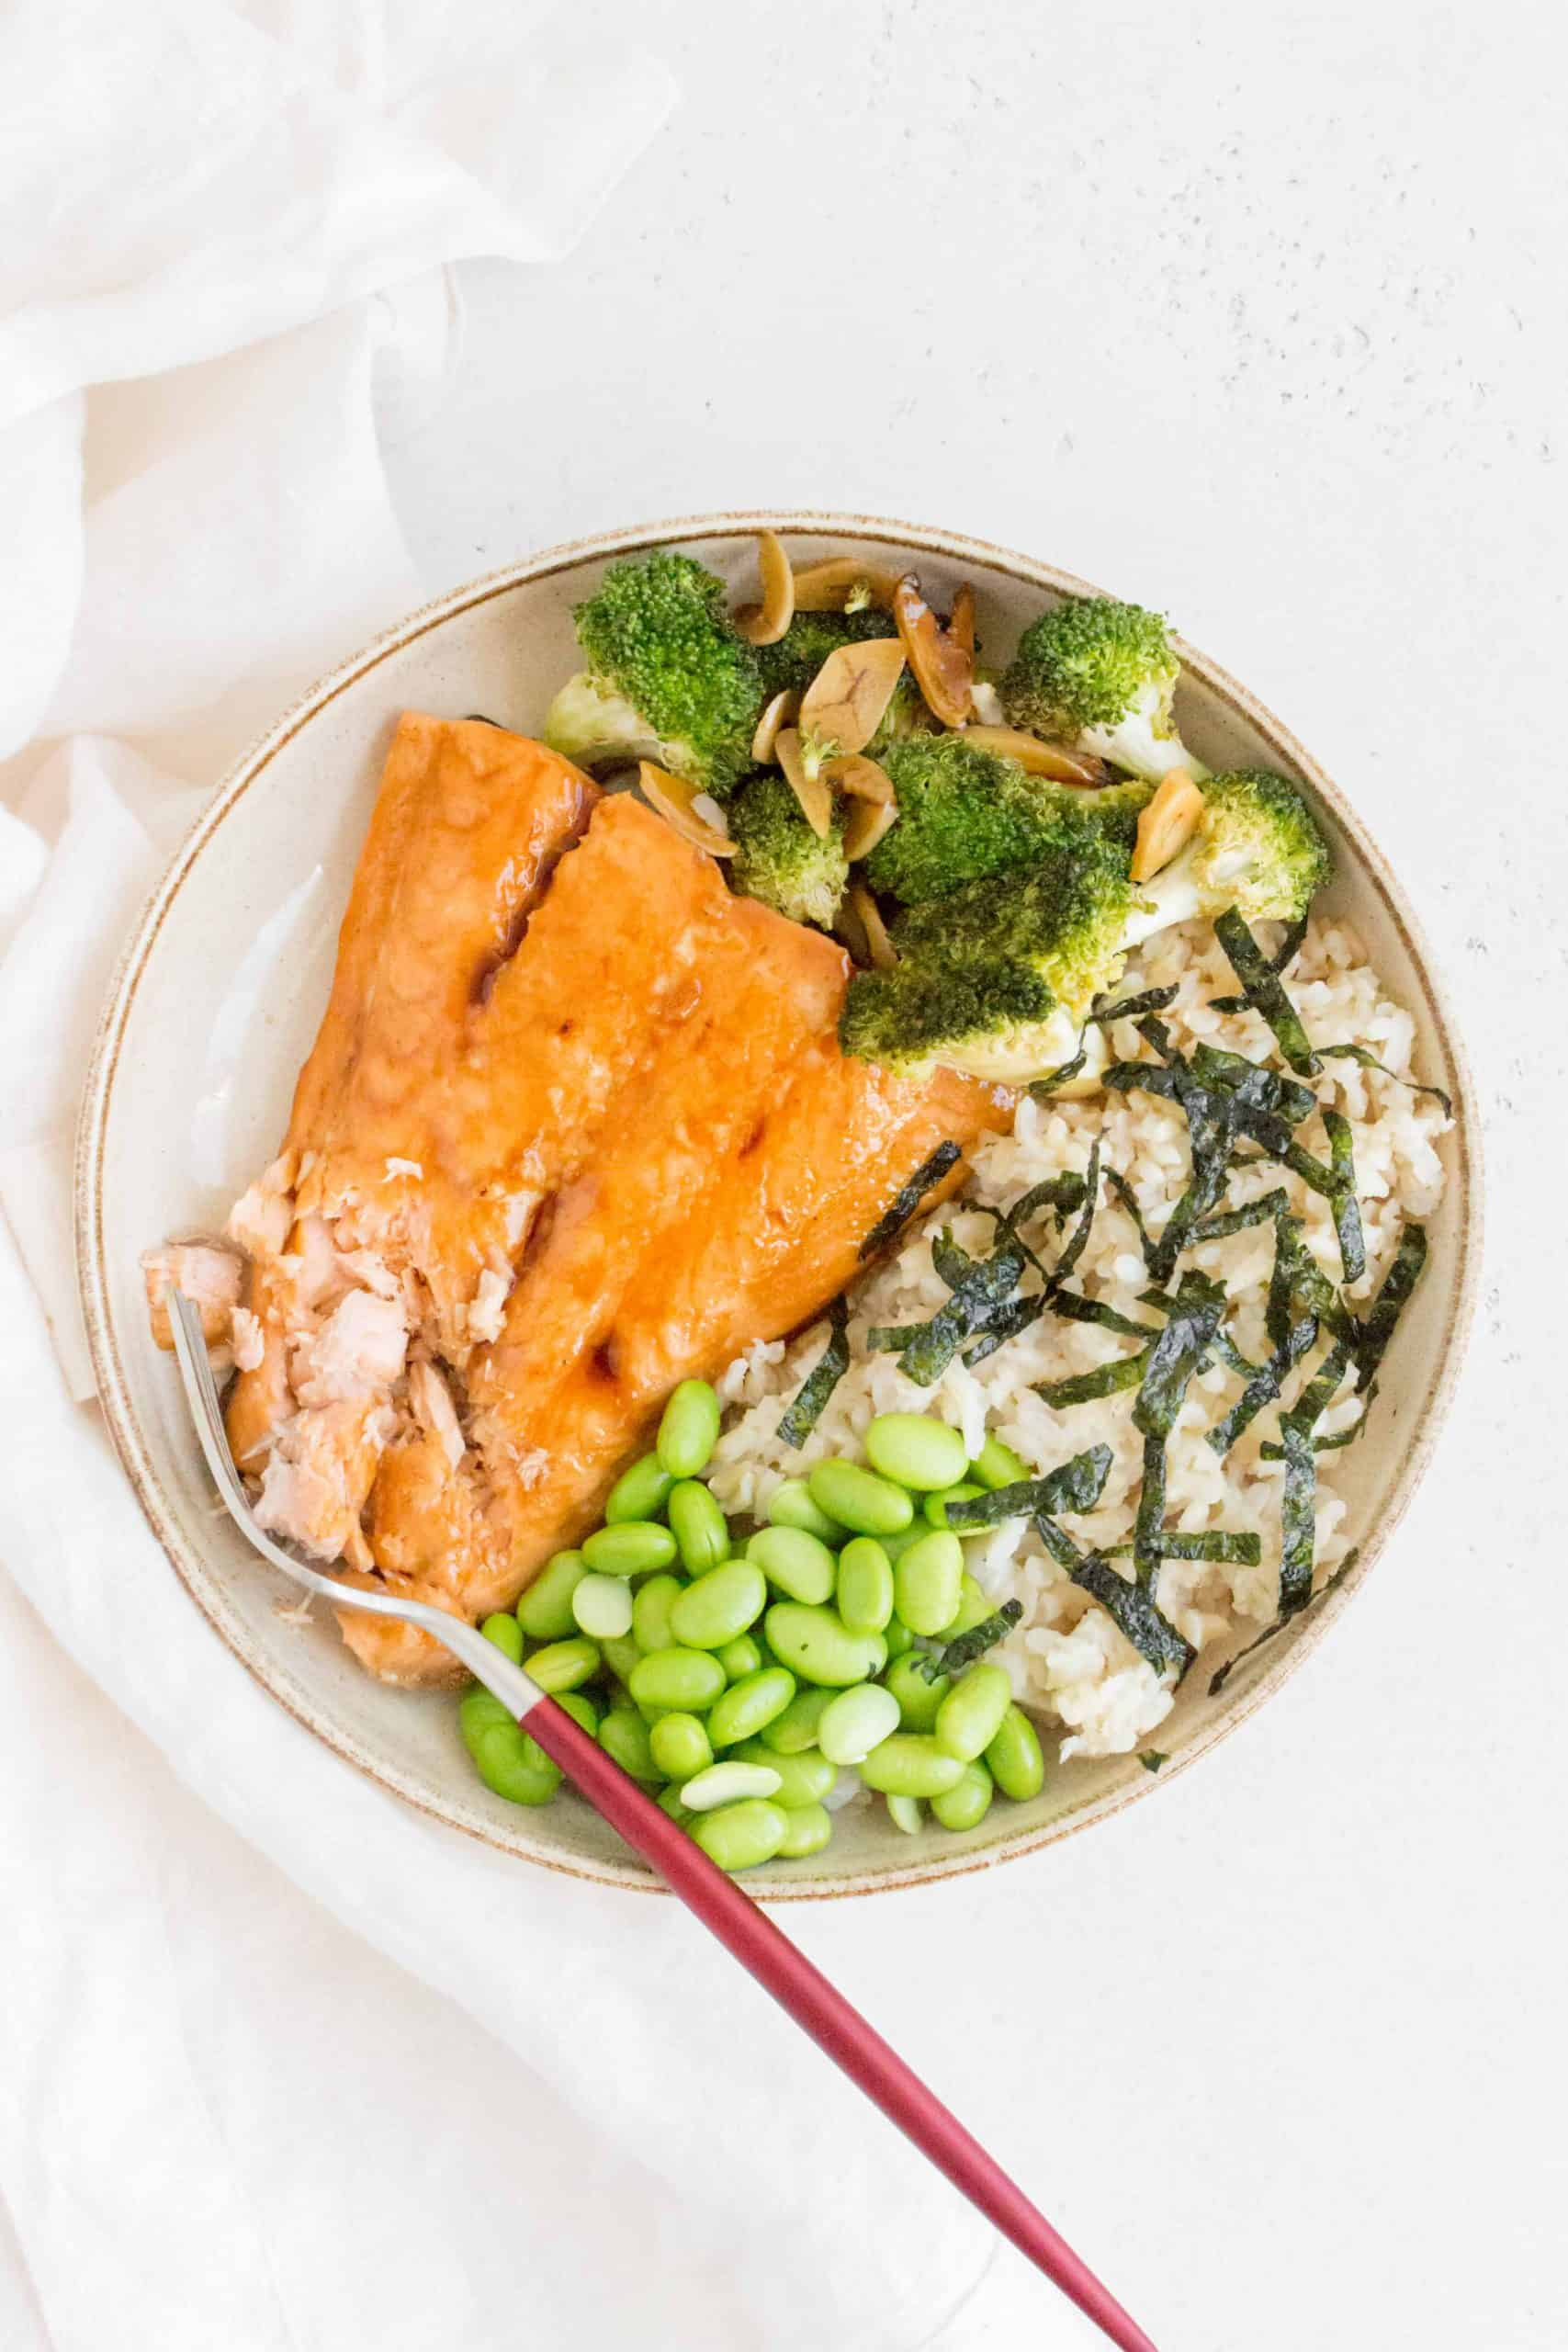 plate with teriyaki salmon broken up by a fork with broccoli, edamame, brown rice, and seaweed